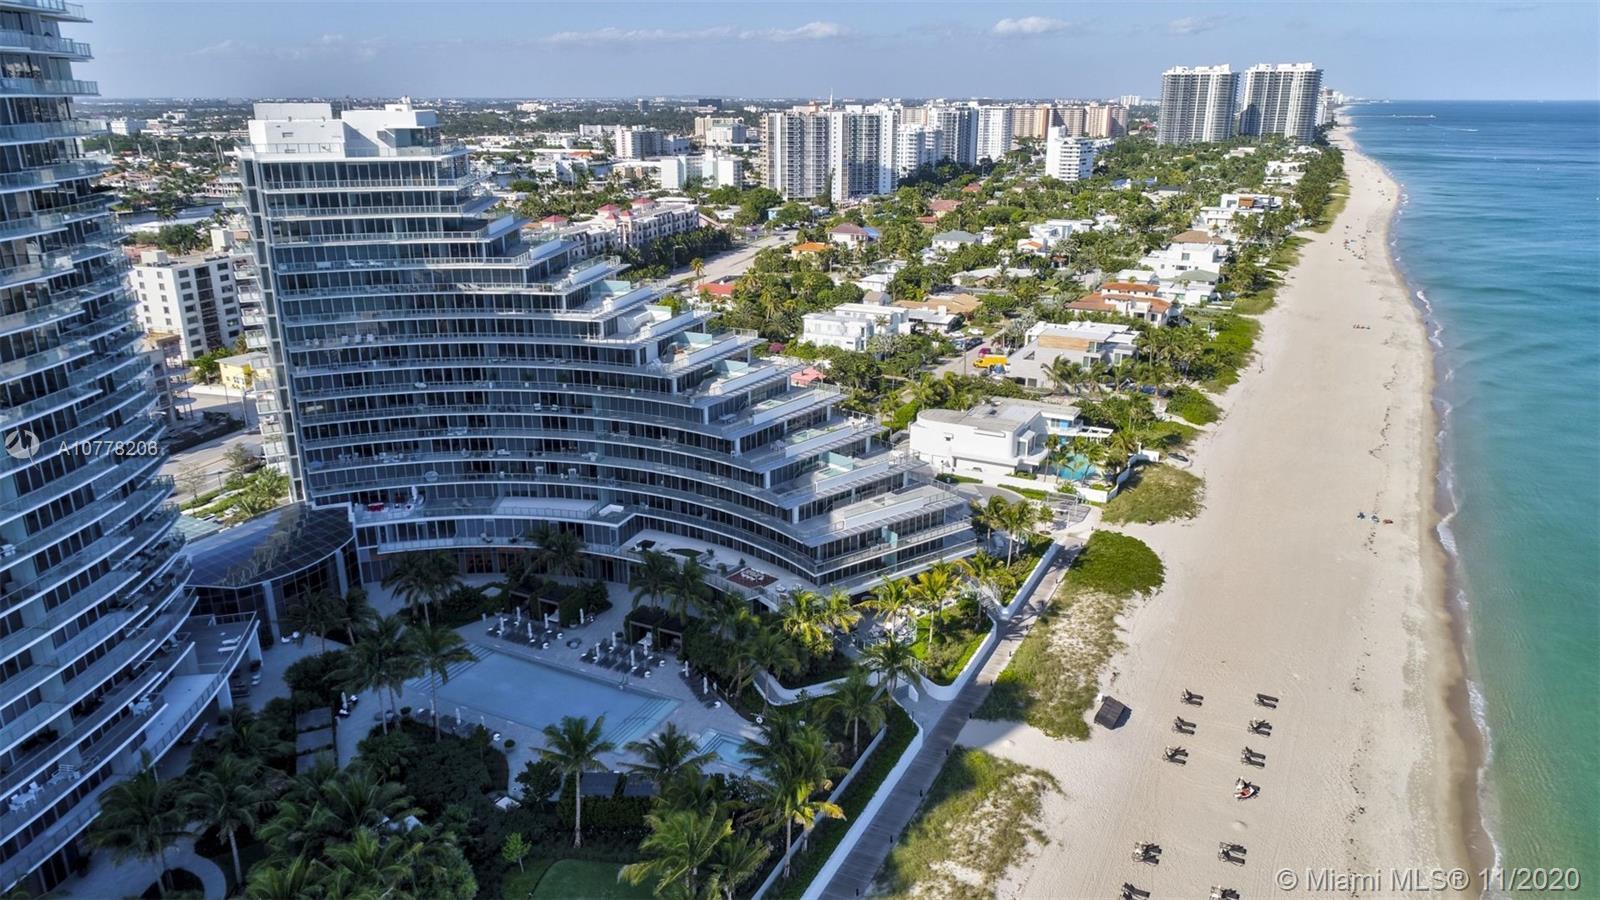 Auberge Beach Residences & Spa image #69